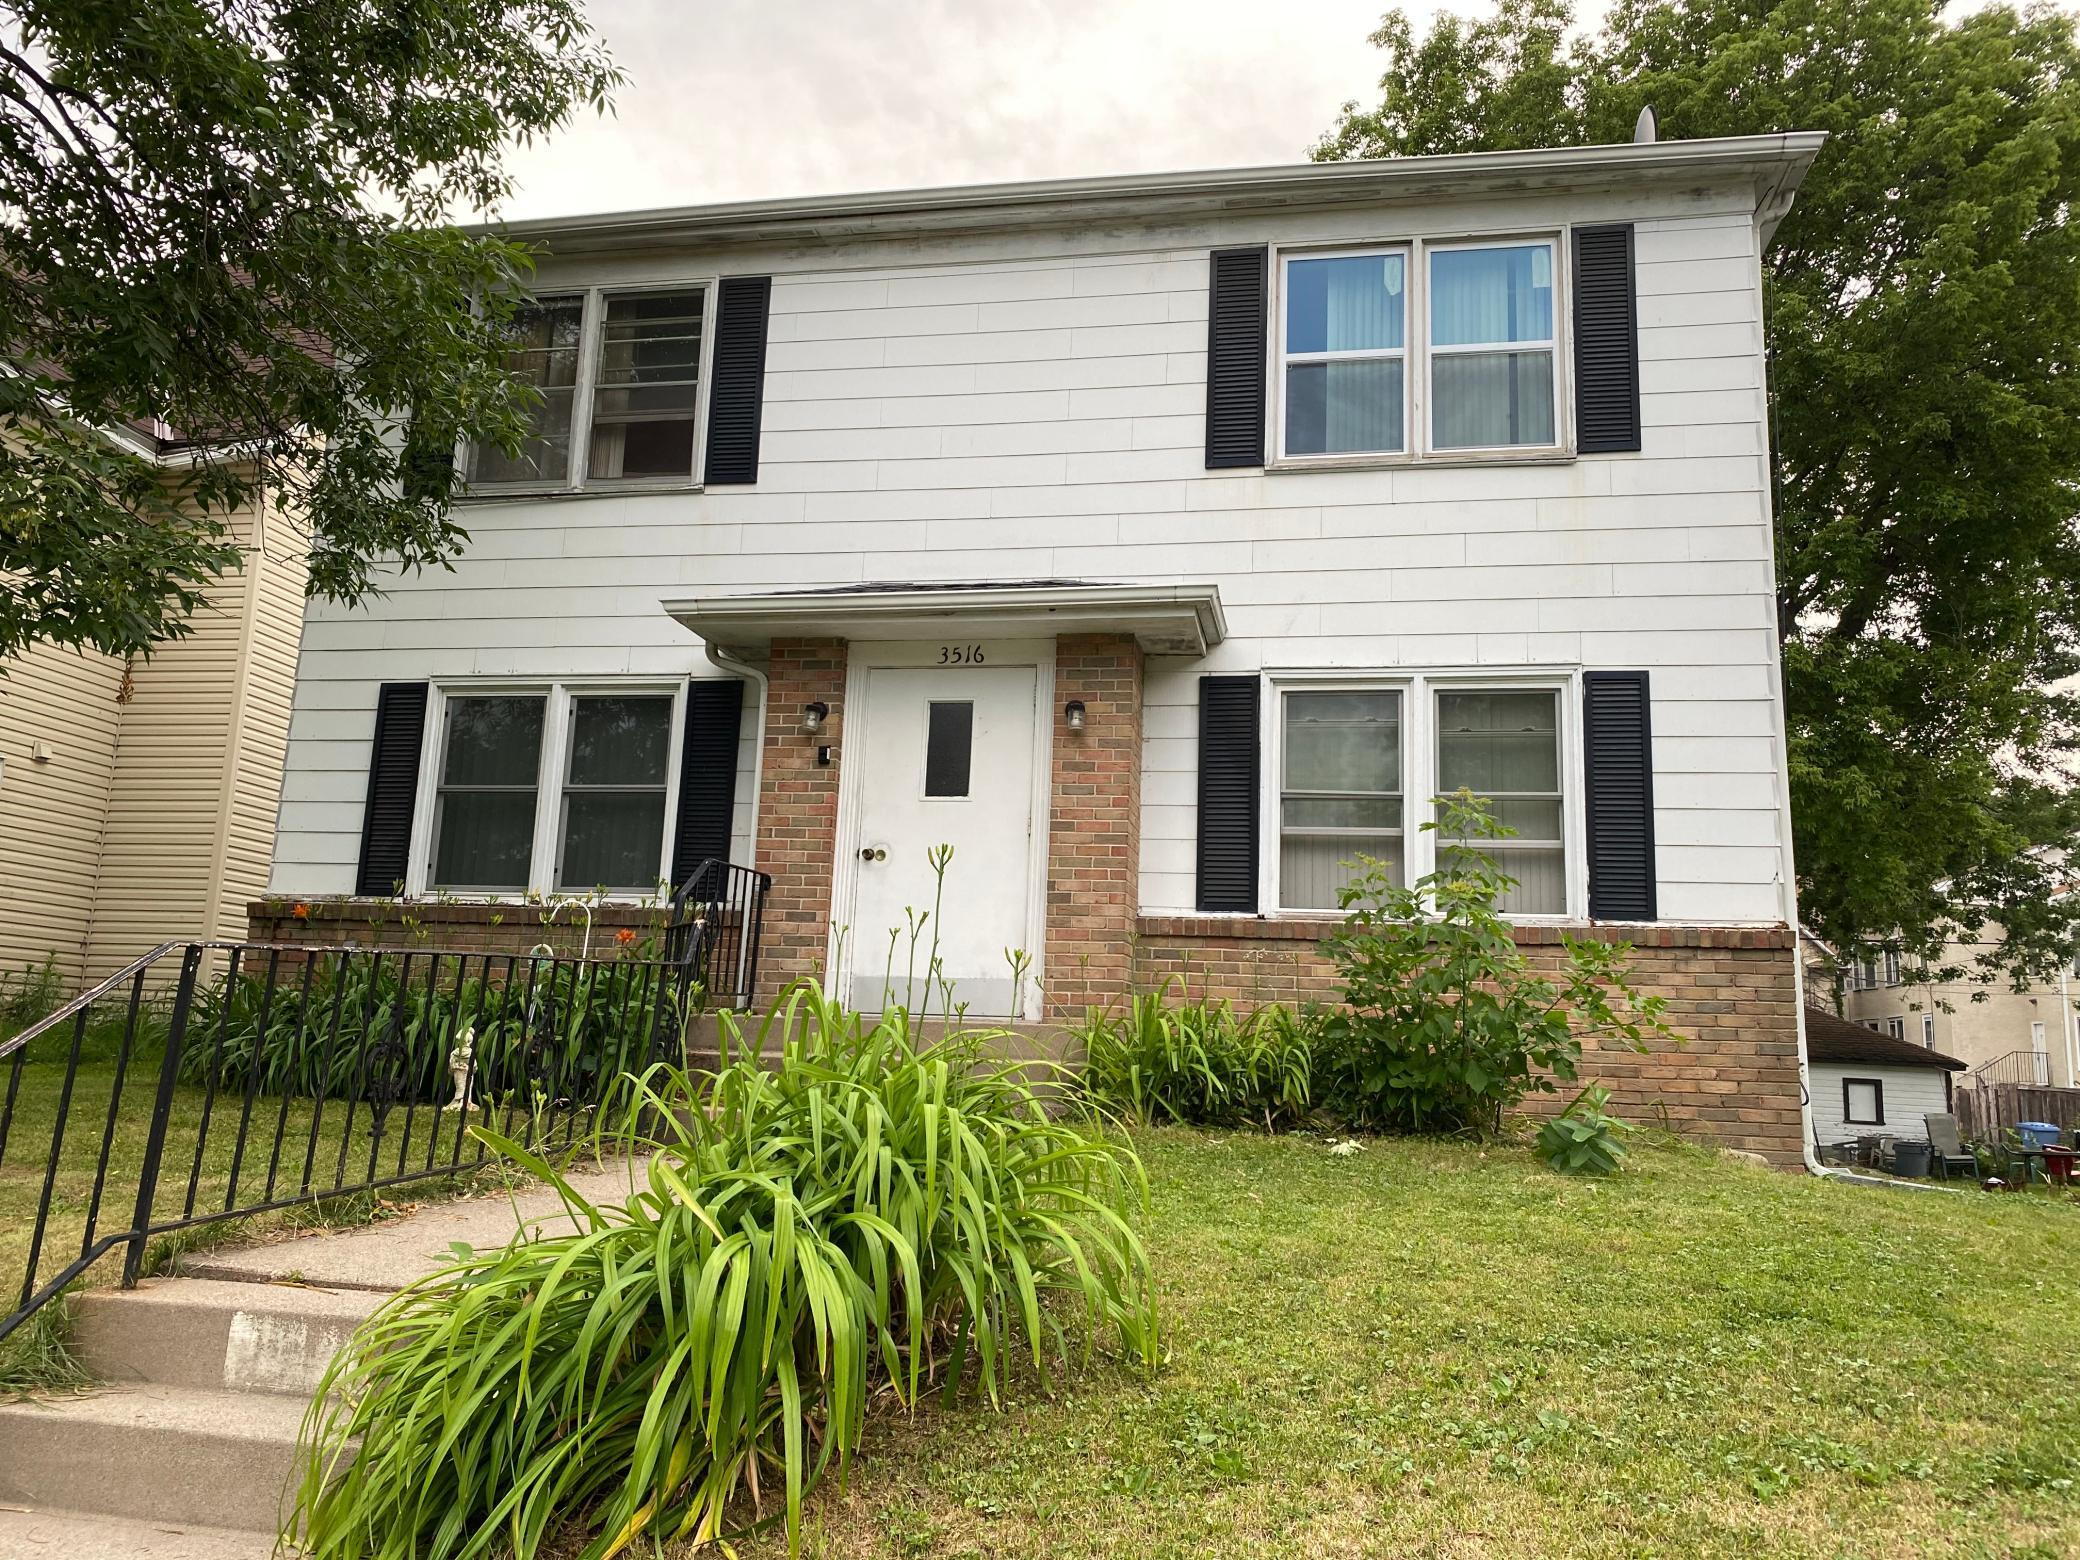 3516 18th Avenue S Property Photo - Minneapolis, MN real estate listing